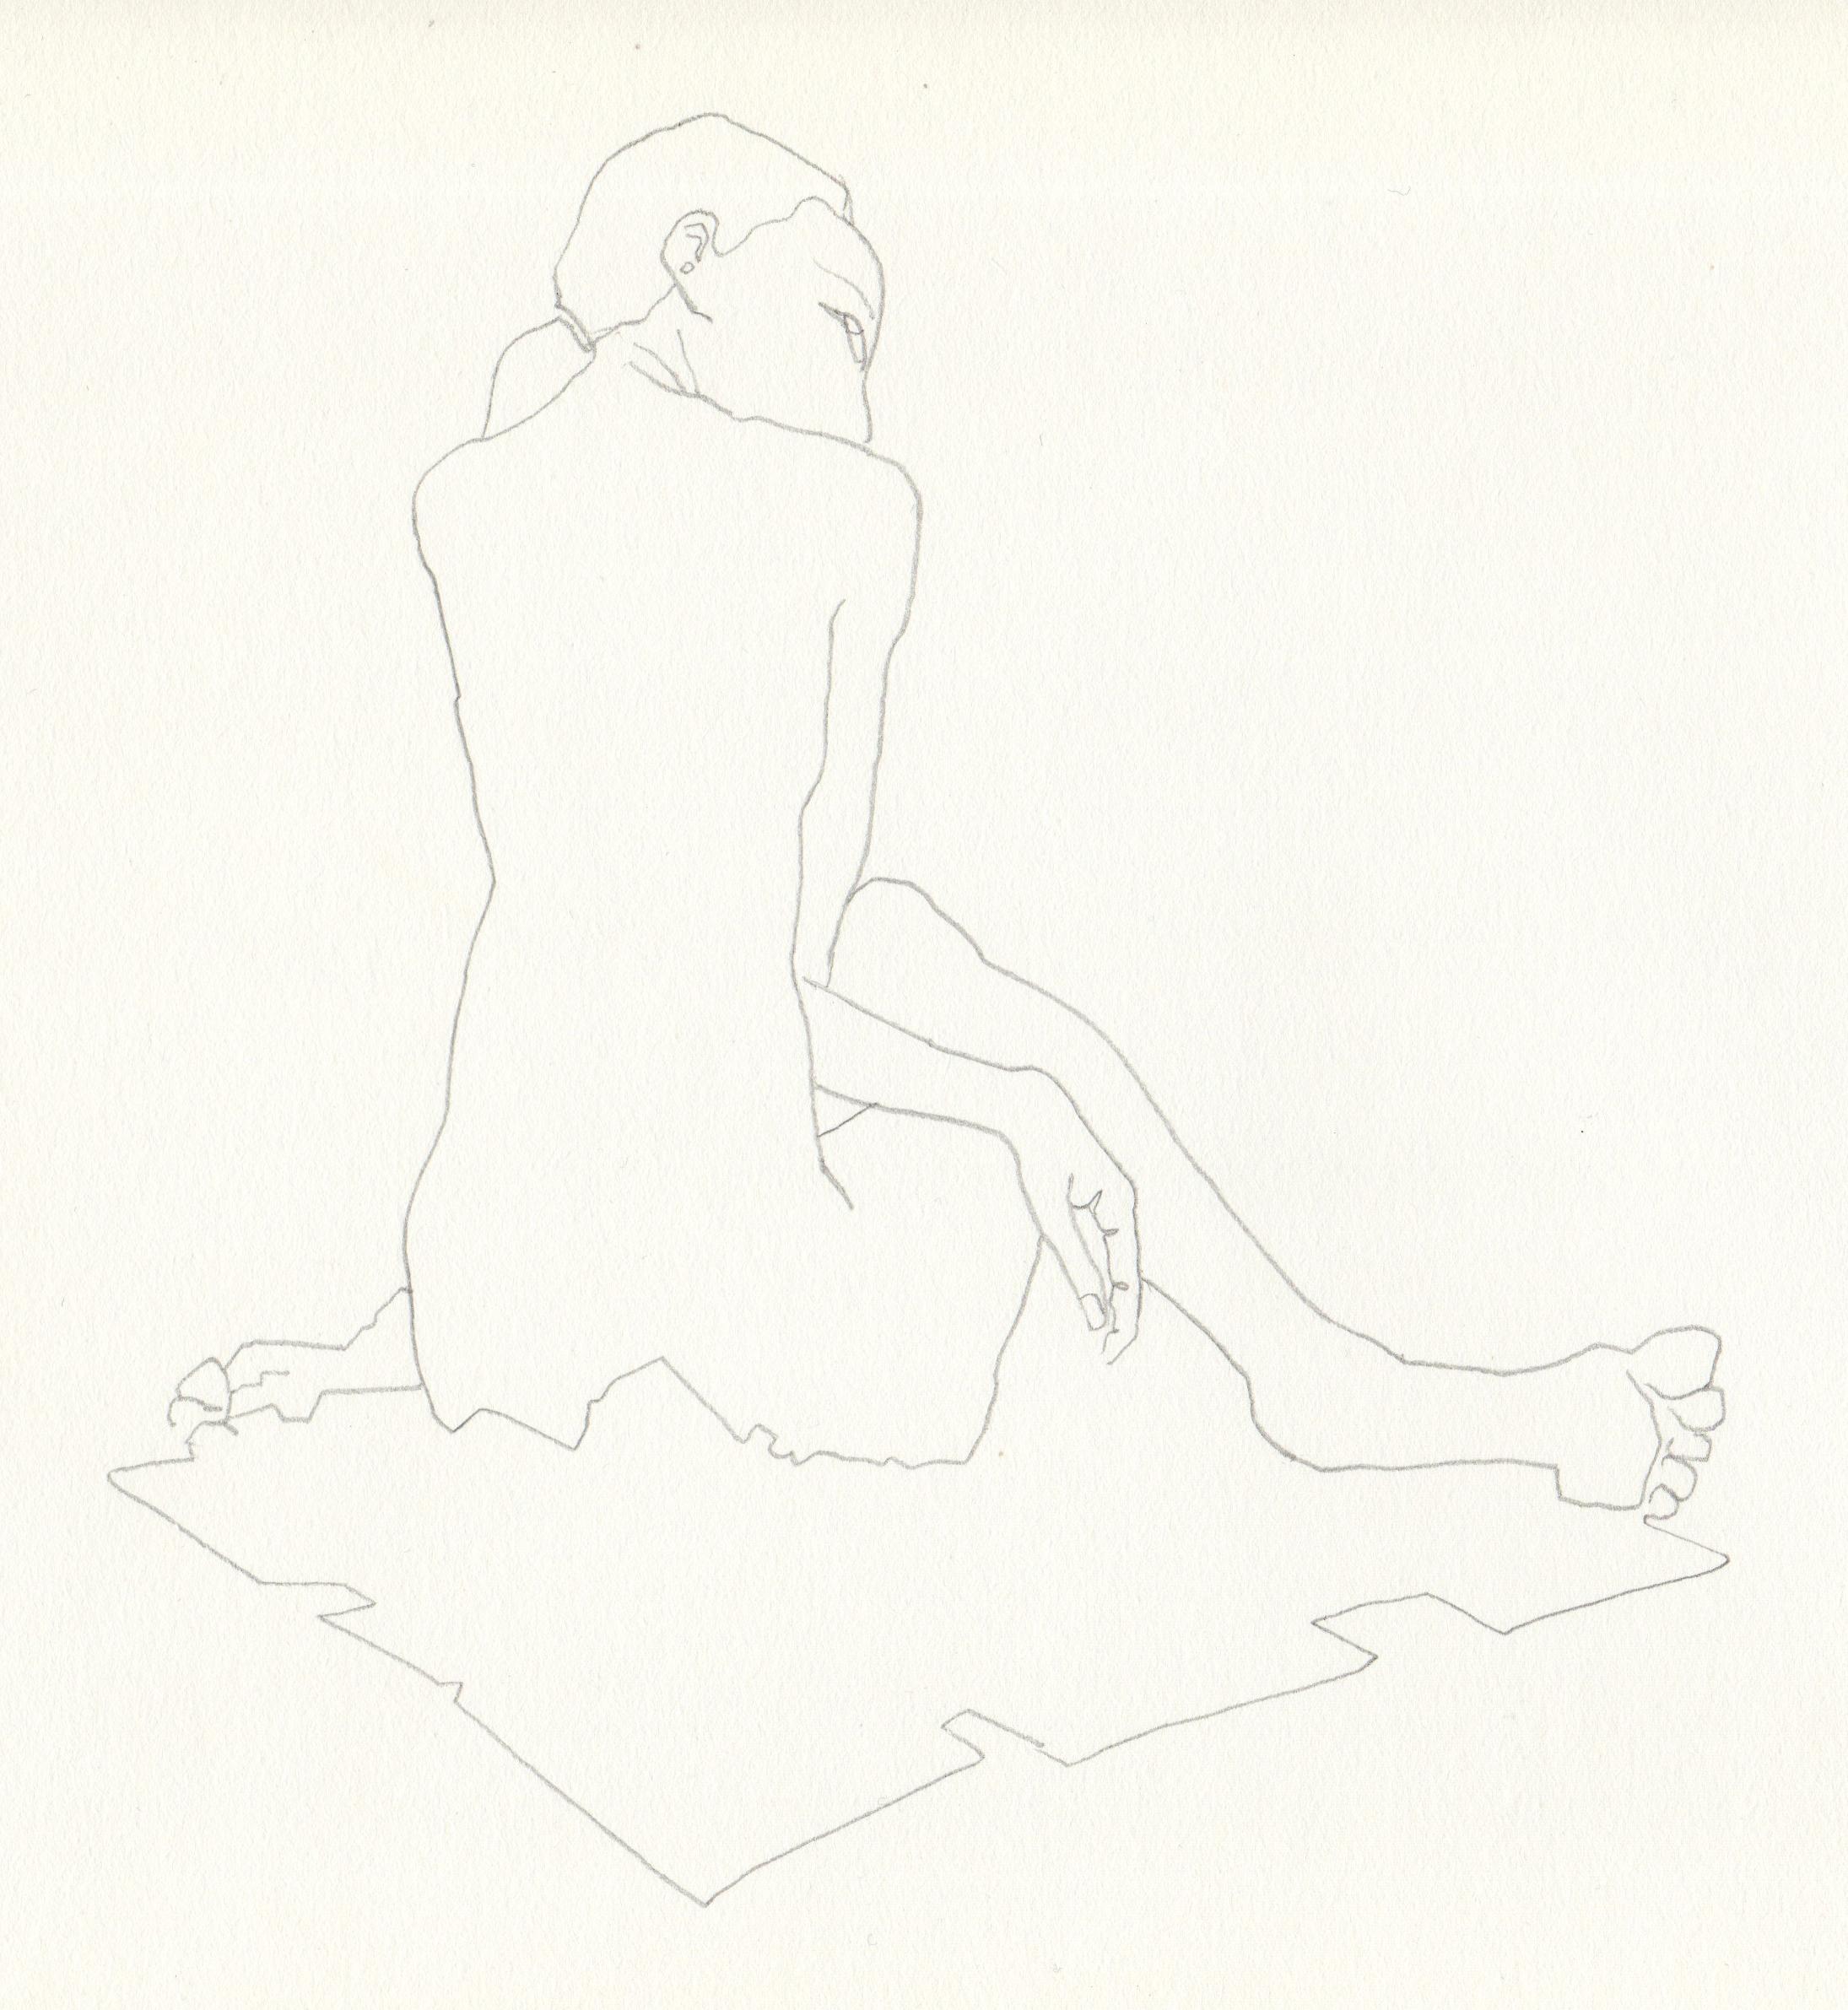 2012_Sketch_F-Beudin_059